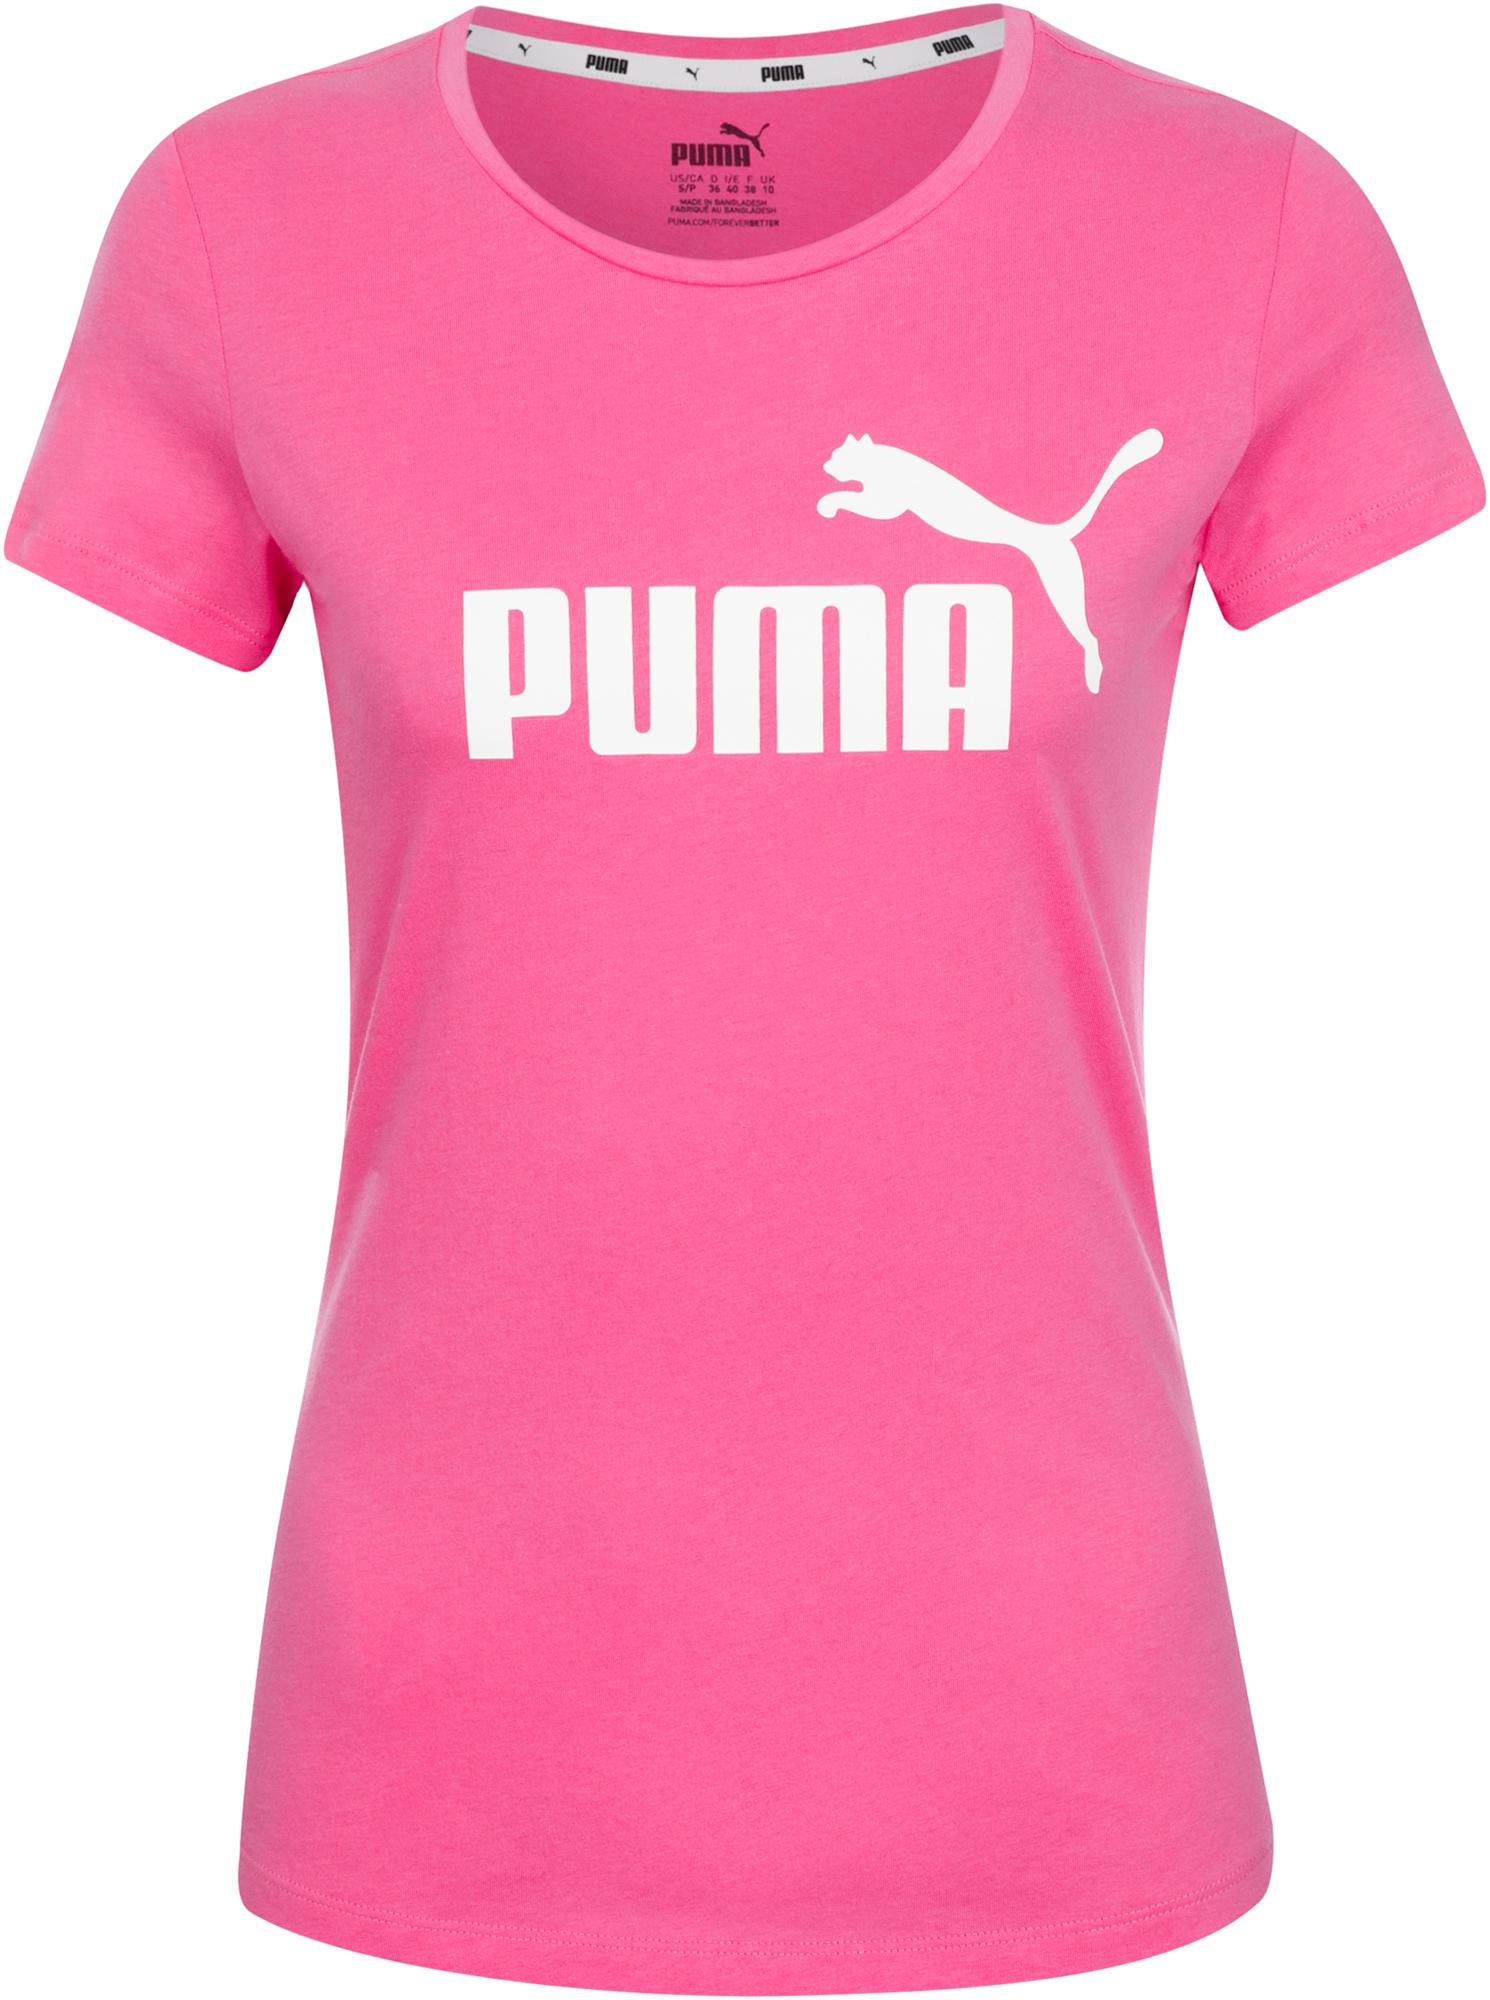 Puma Футболка женская Puma Ess Logo, размер 42-44 puma худи женская puma amplified cropped размер 42 44